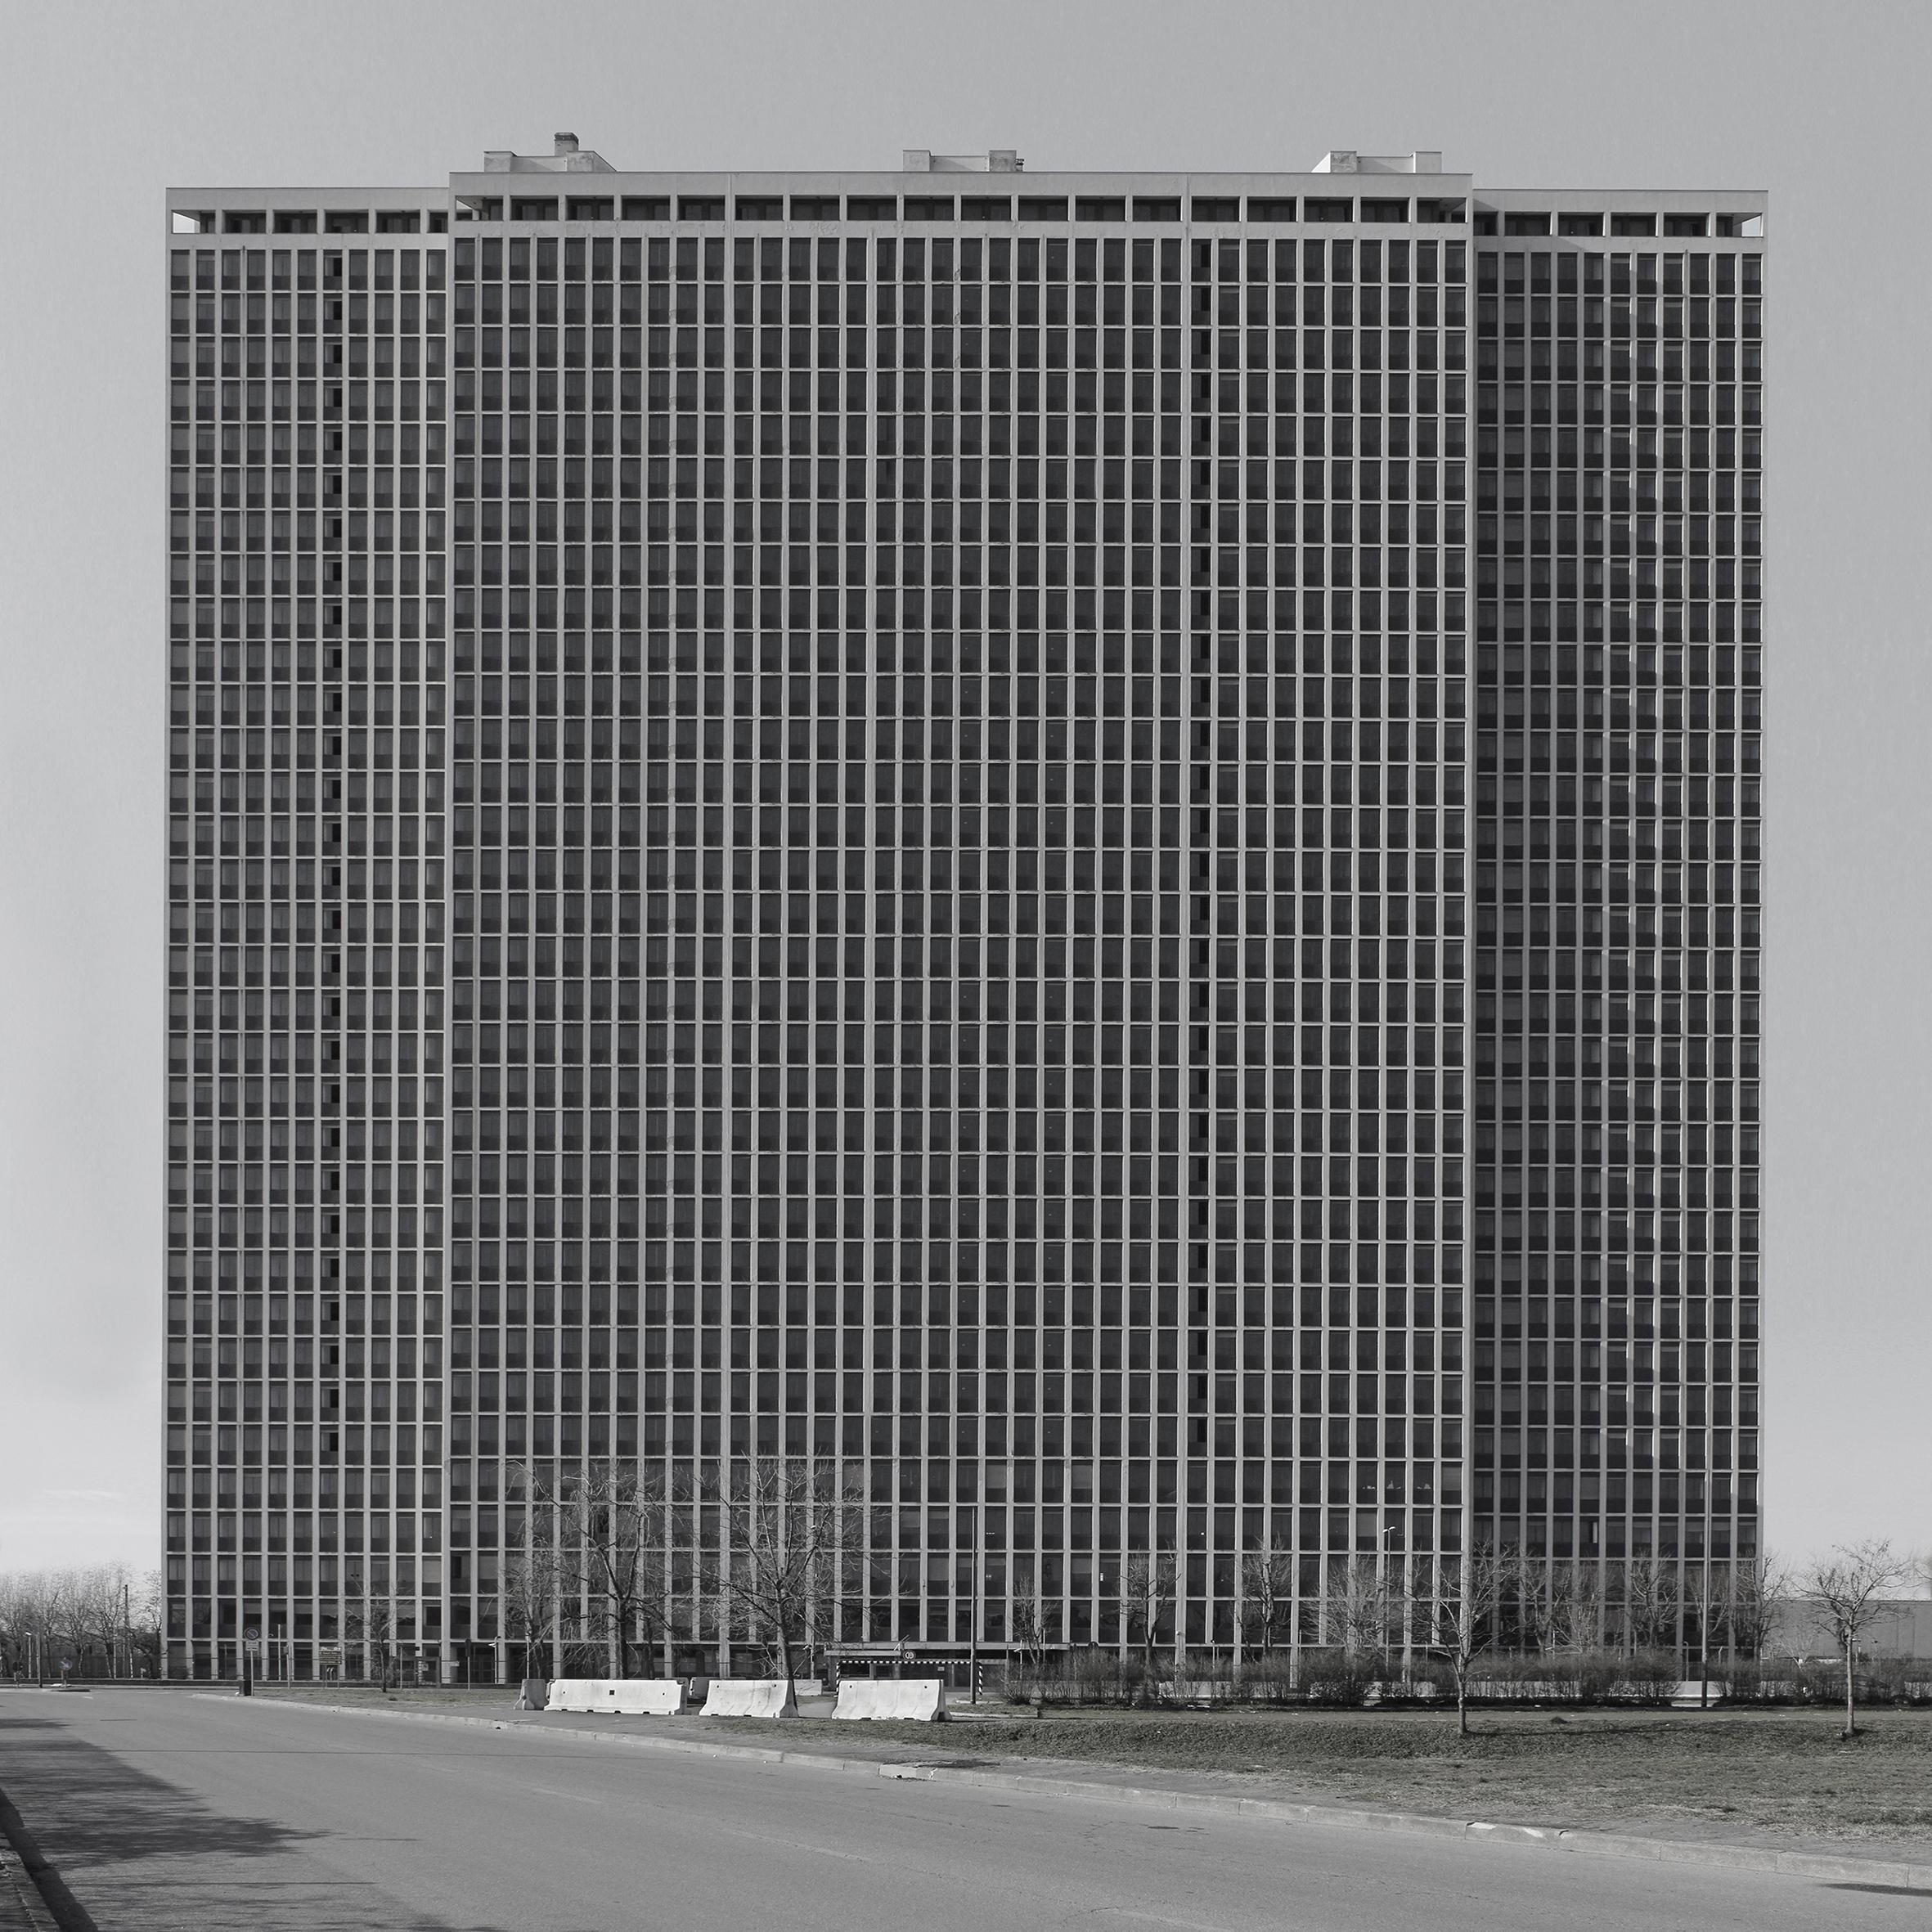 dritan-hyska-objekt-18-2013-c-print-on-dibond-100x100cm-courtesy-of-artist